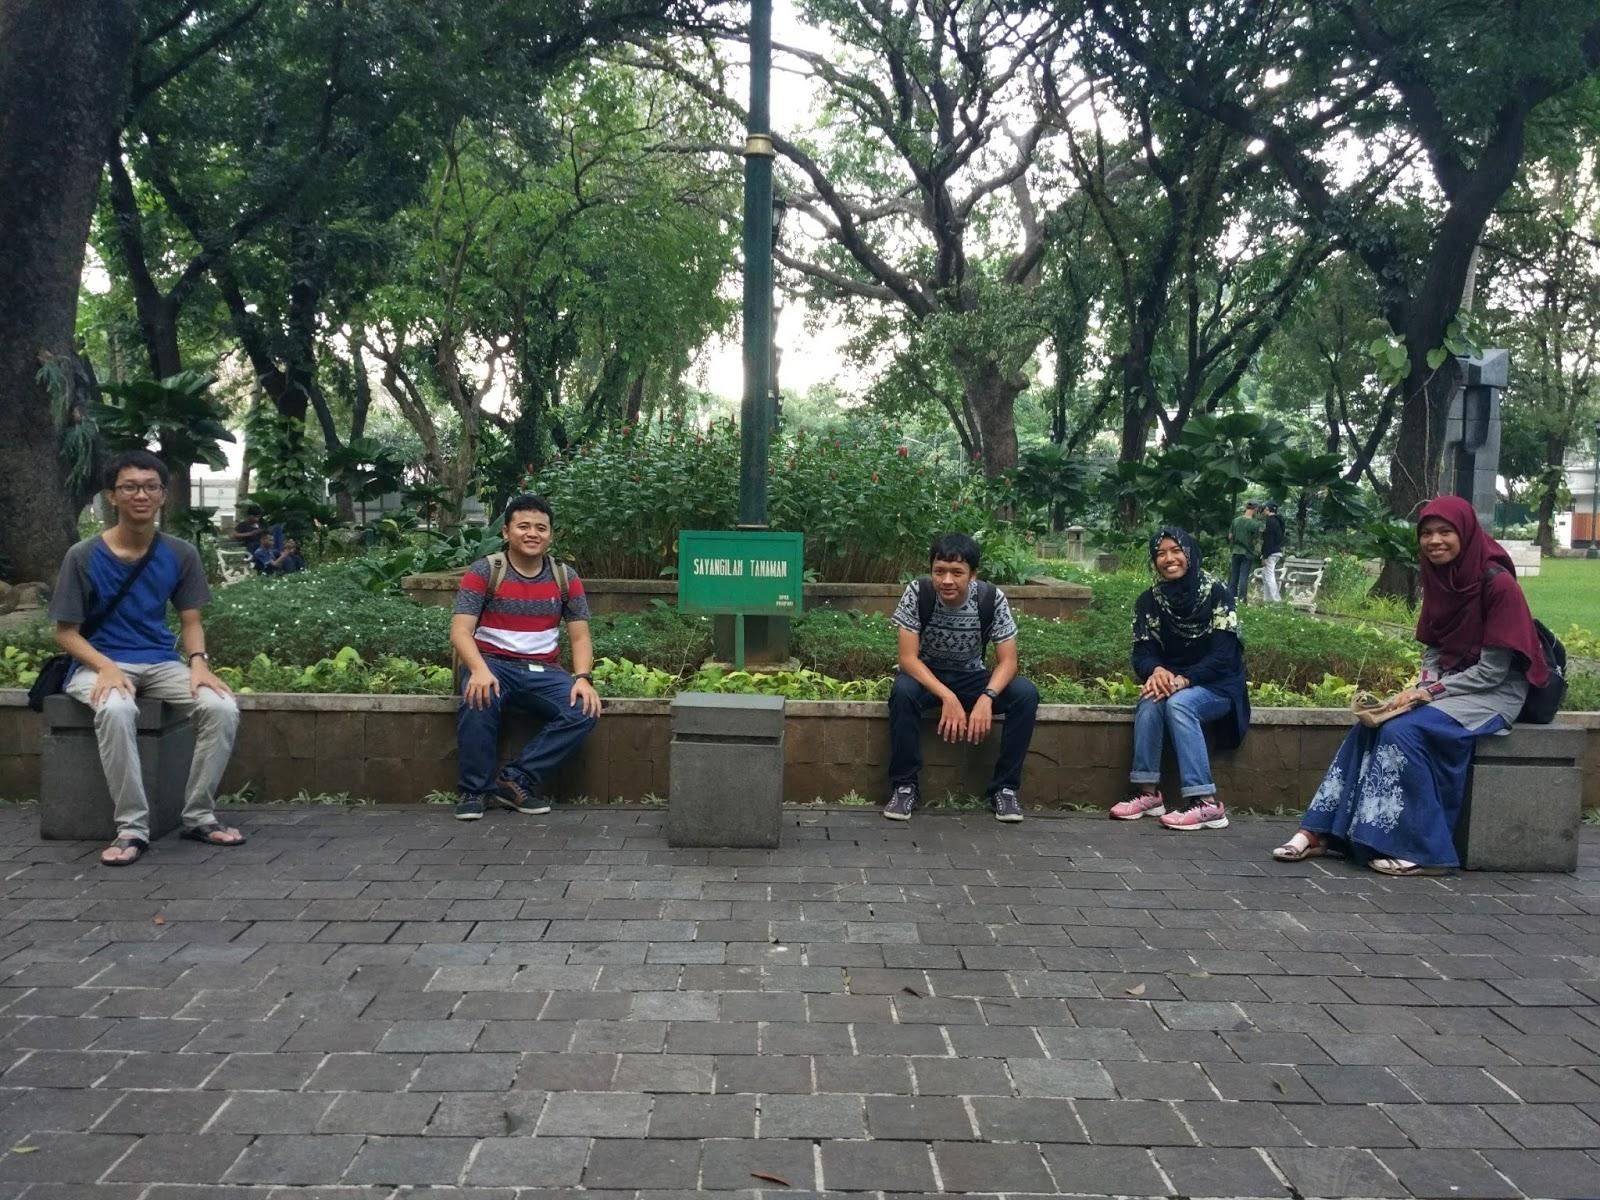 Autumn Sejarah Taman Suropati Kelompok Kota Administrasi Jakarta Pusat